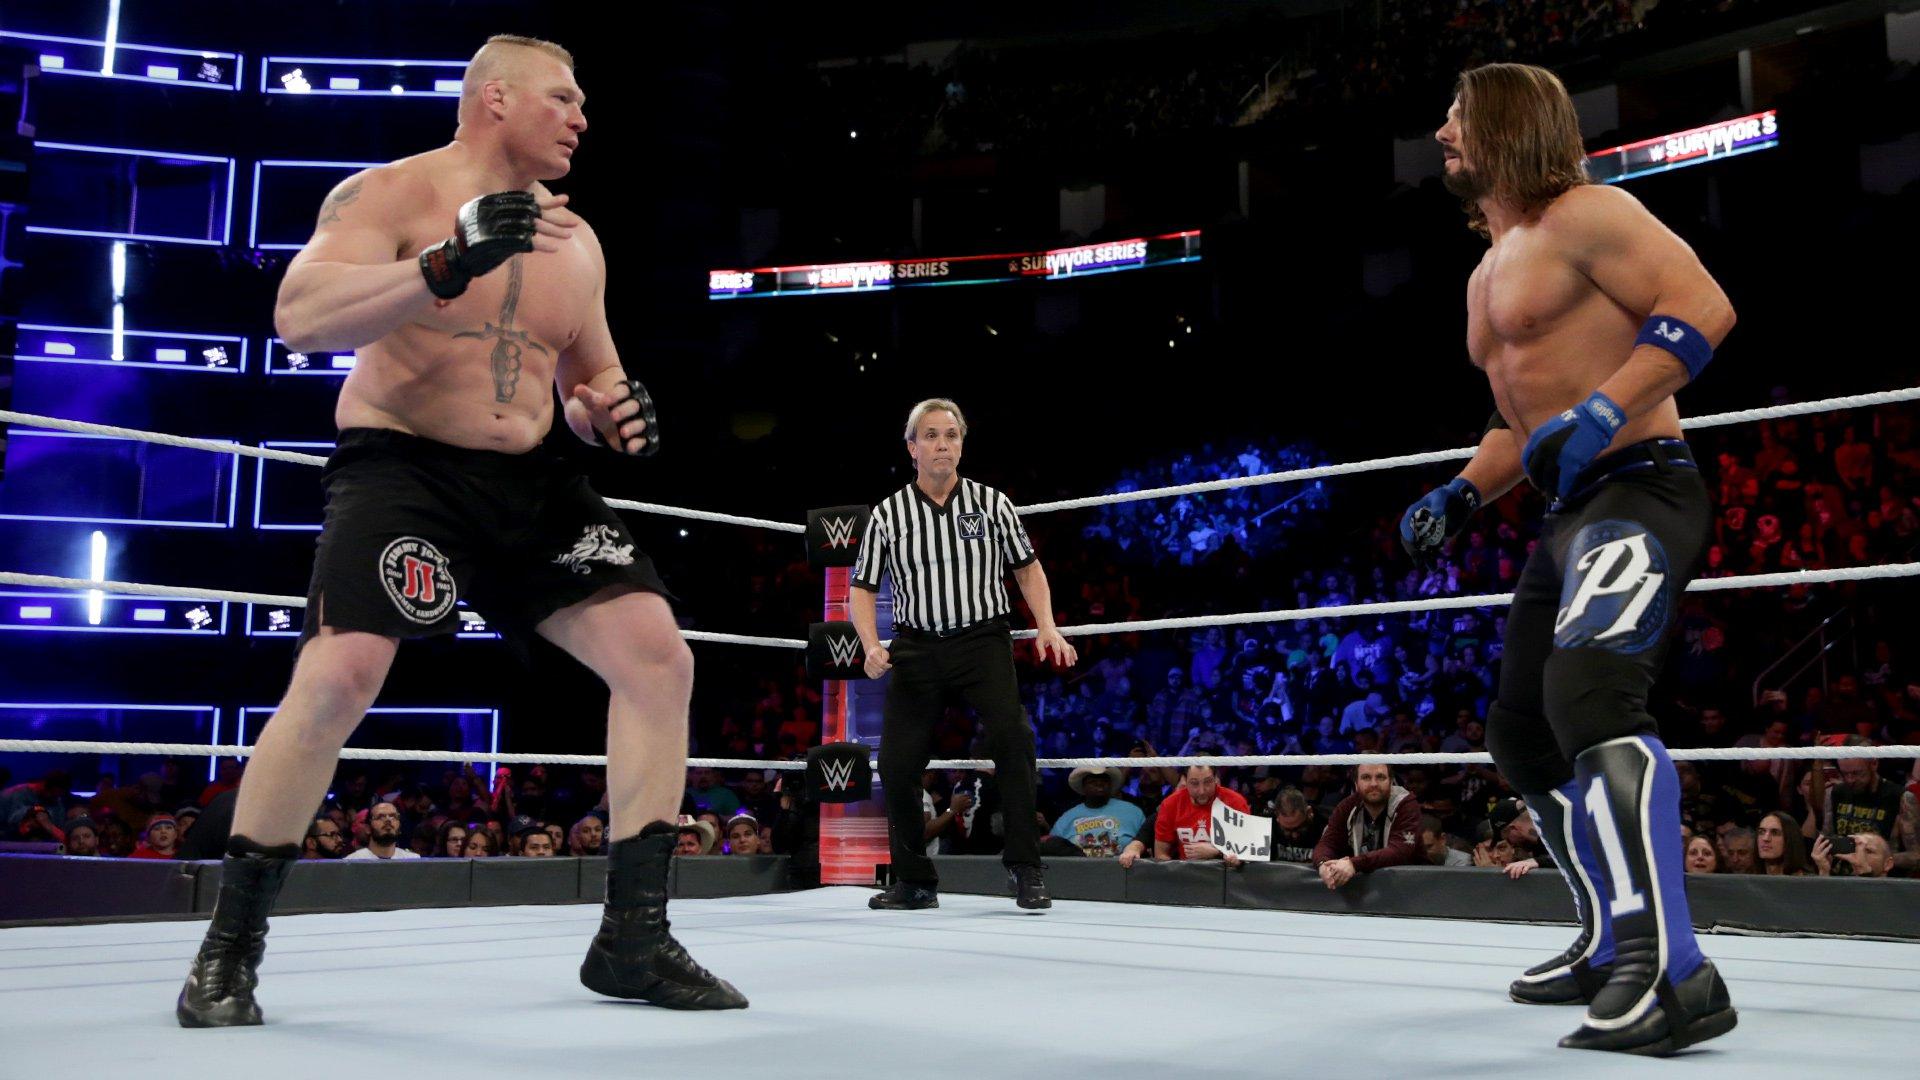 WWE Survivor Series 2017 Review 11/19/2017